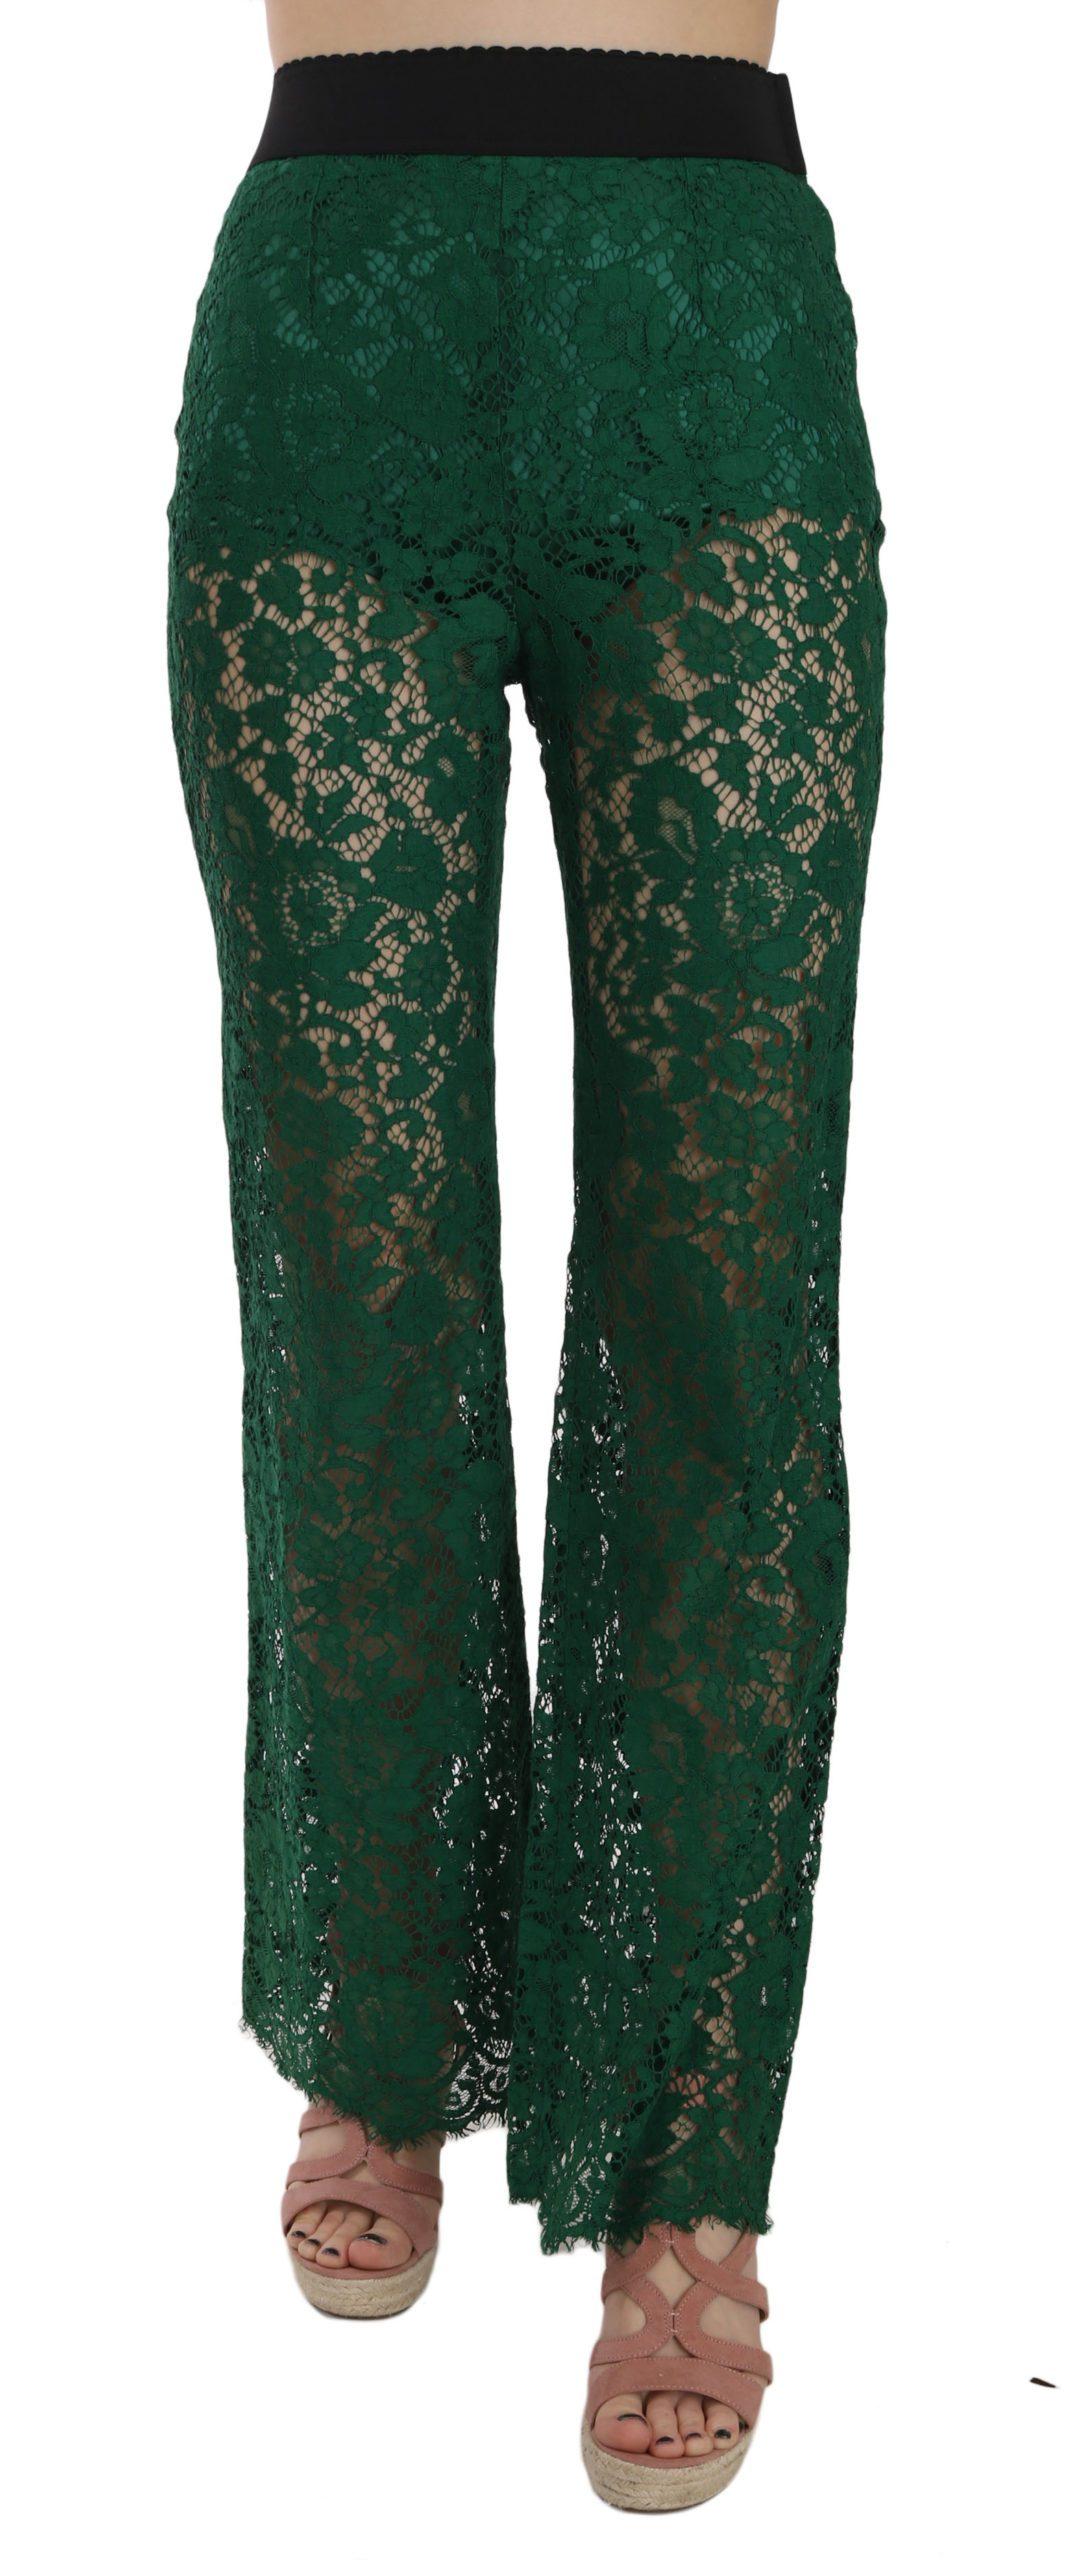 Dolce & Gabbana Women's Floral Lace Green Palazzo Trouser Green PAN70030 - IT38|XS